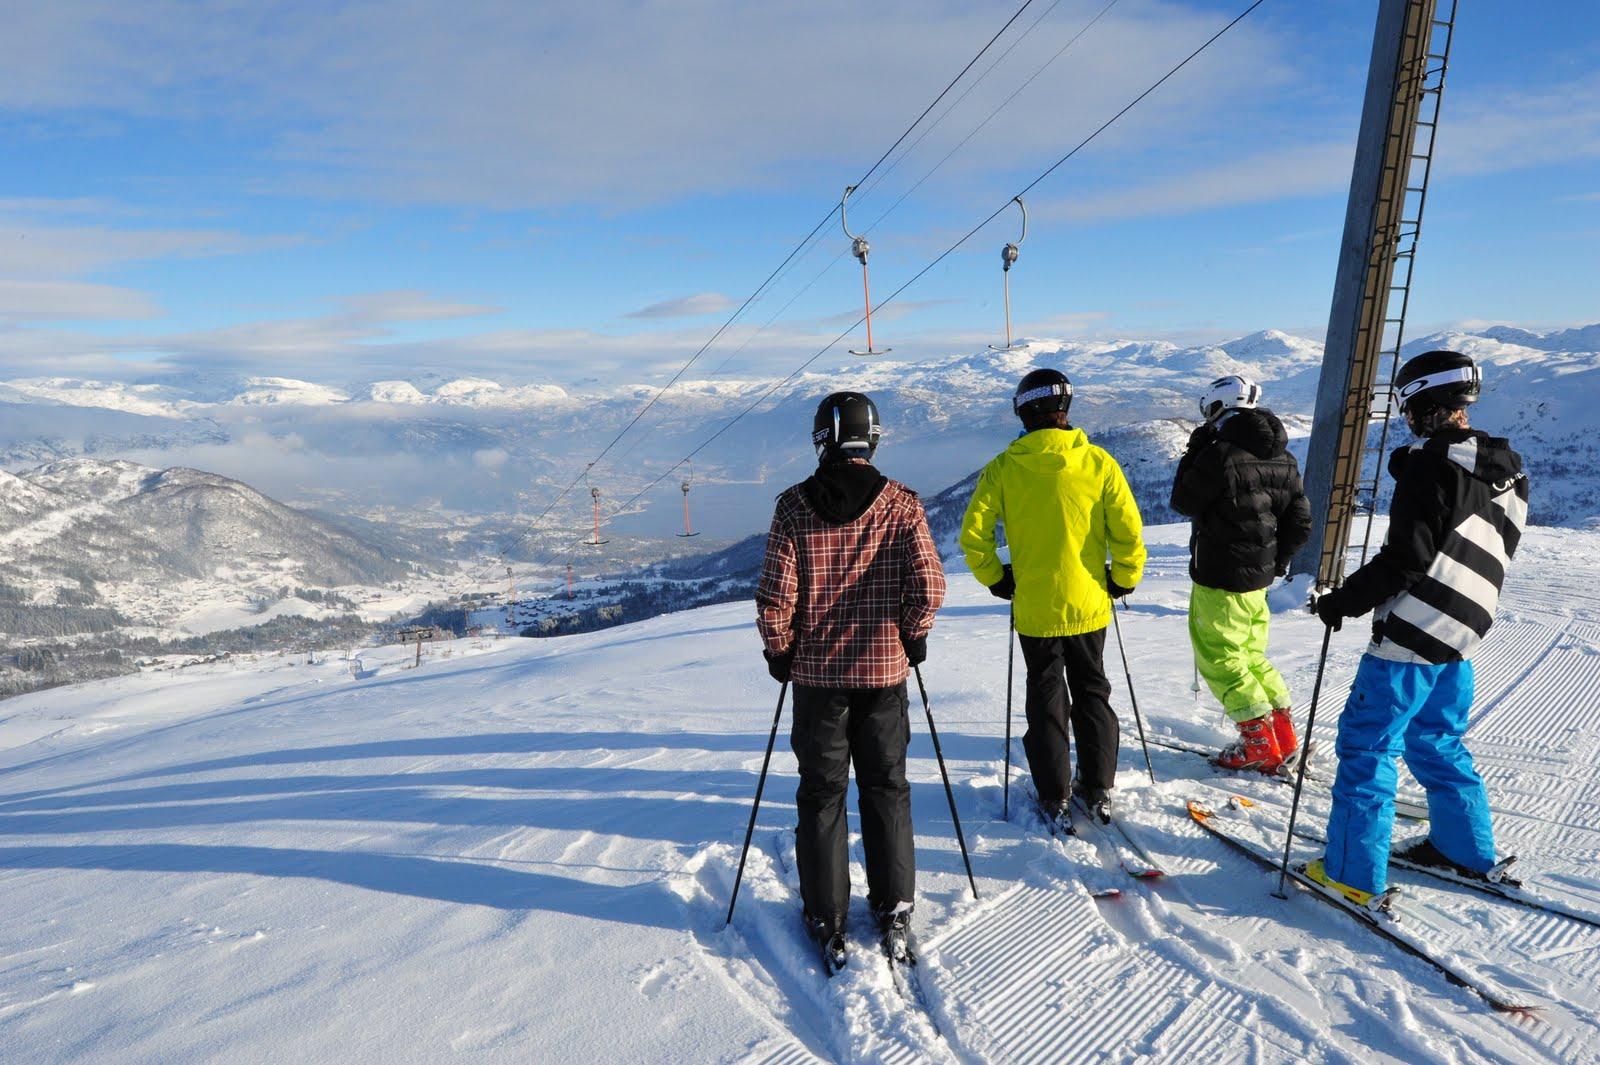 Ungdommar på ski i Sauda skisenter